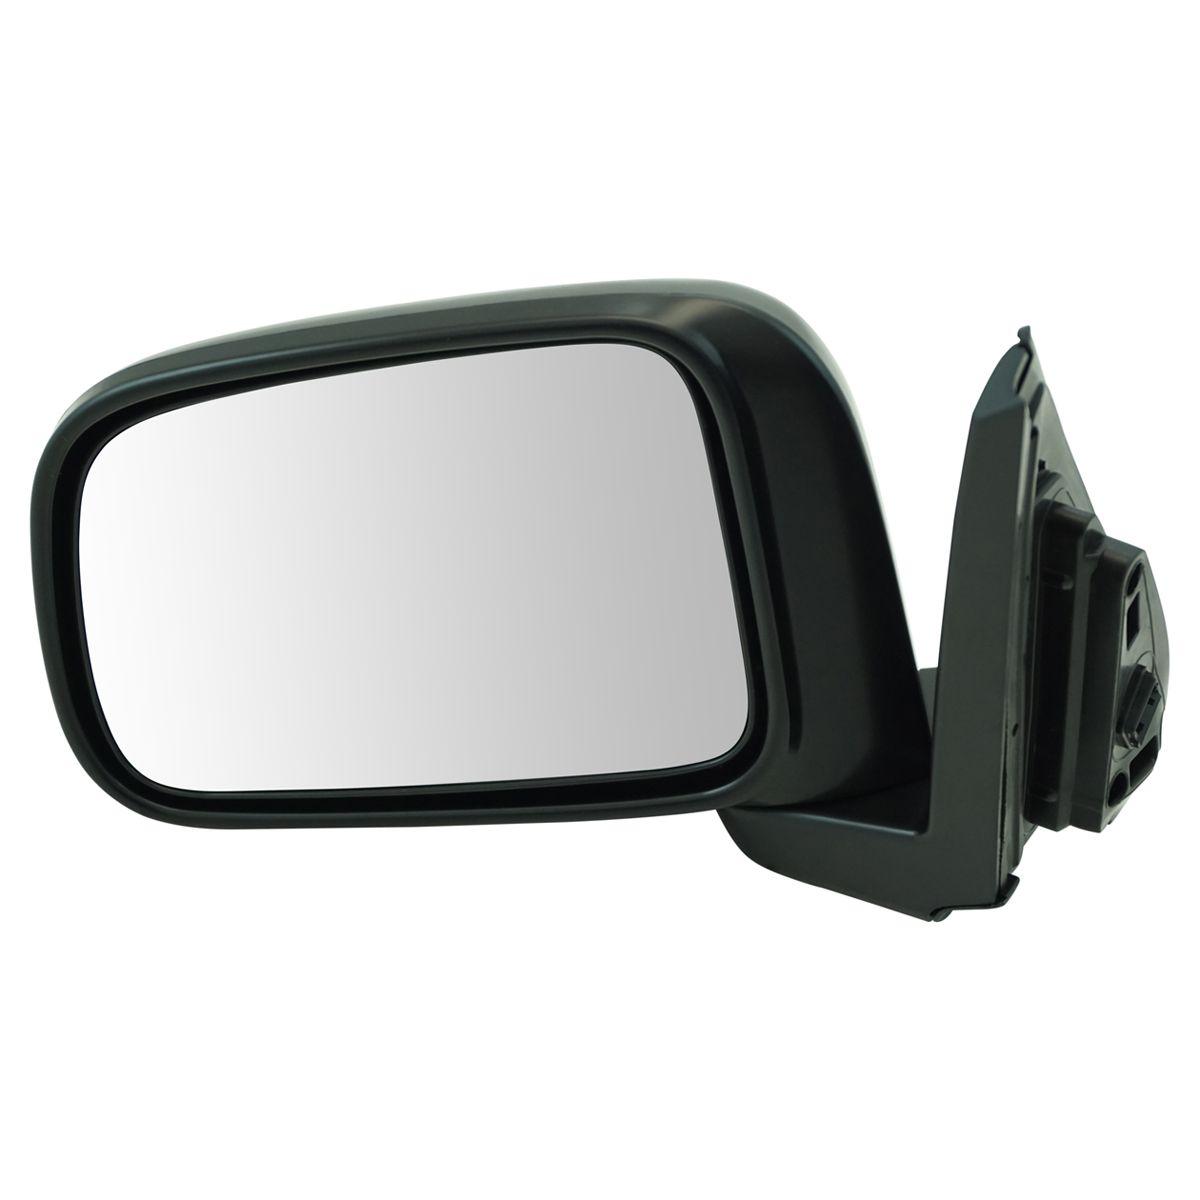 Honda CR-V 97-06 Left Door Driver  Side Rear View Mirror Glass LH OEM